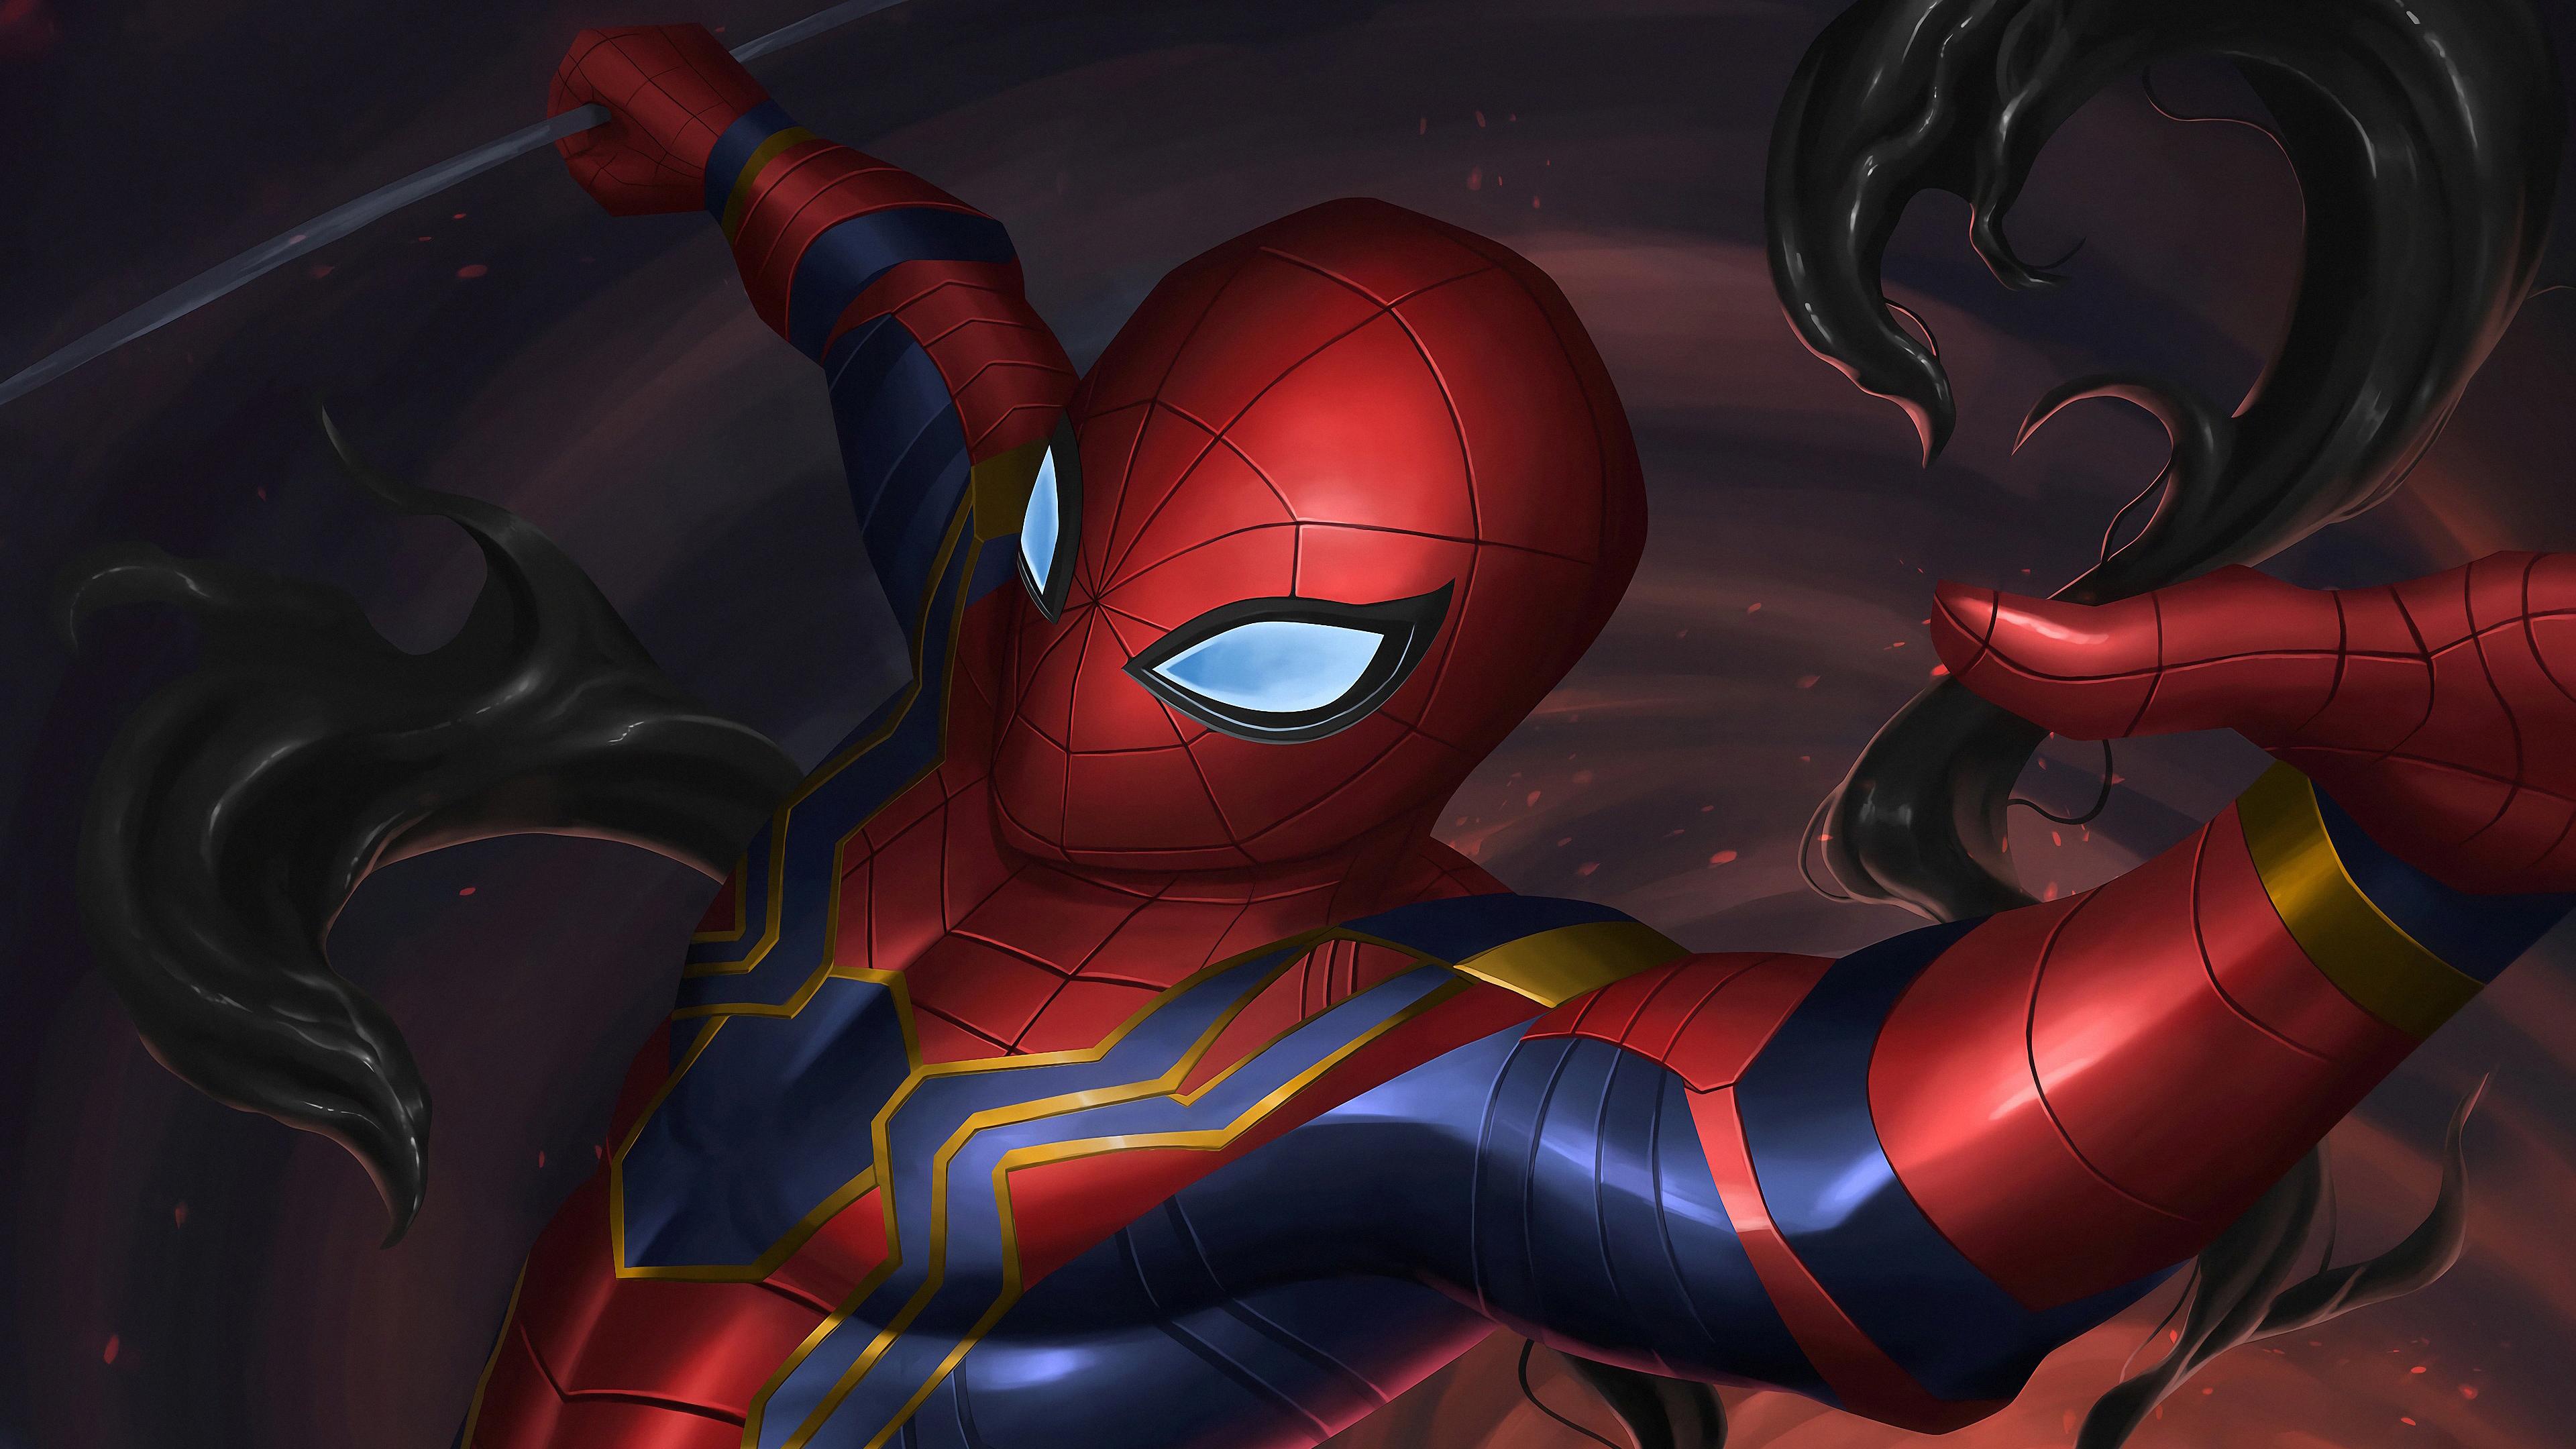 new spider suit 1569186544 - New Spider Suit - superheroes wallpapers, spiderman wallpapers, hd-wallpapers, digital art wallpapers, artwork wallpapers, artstation wallpapers, art wallpapers, 4k-wallpapers